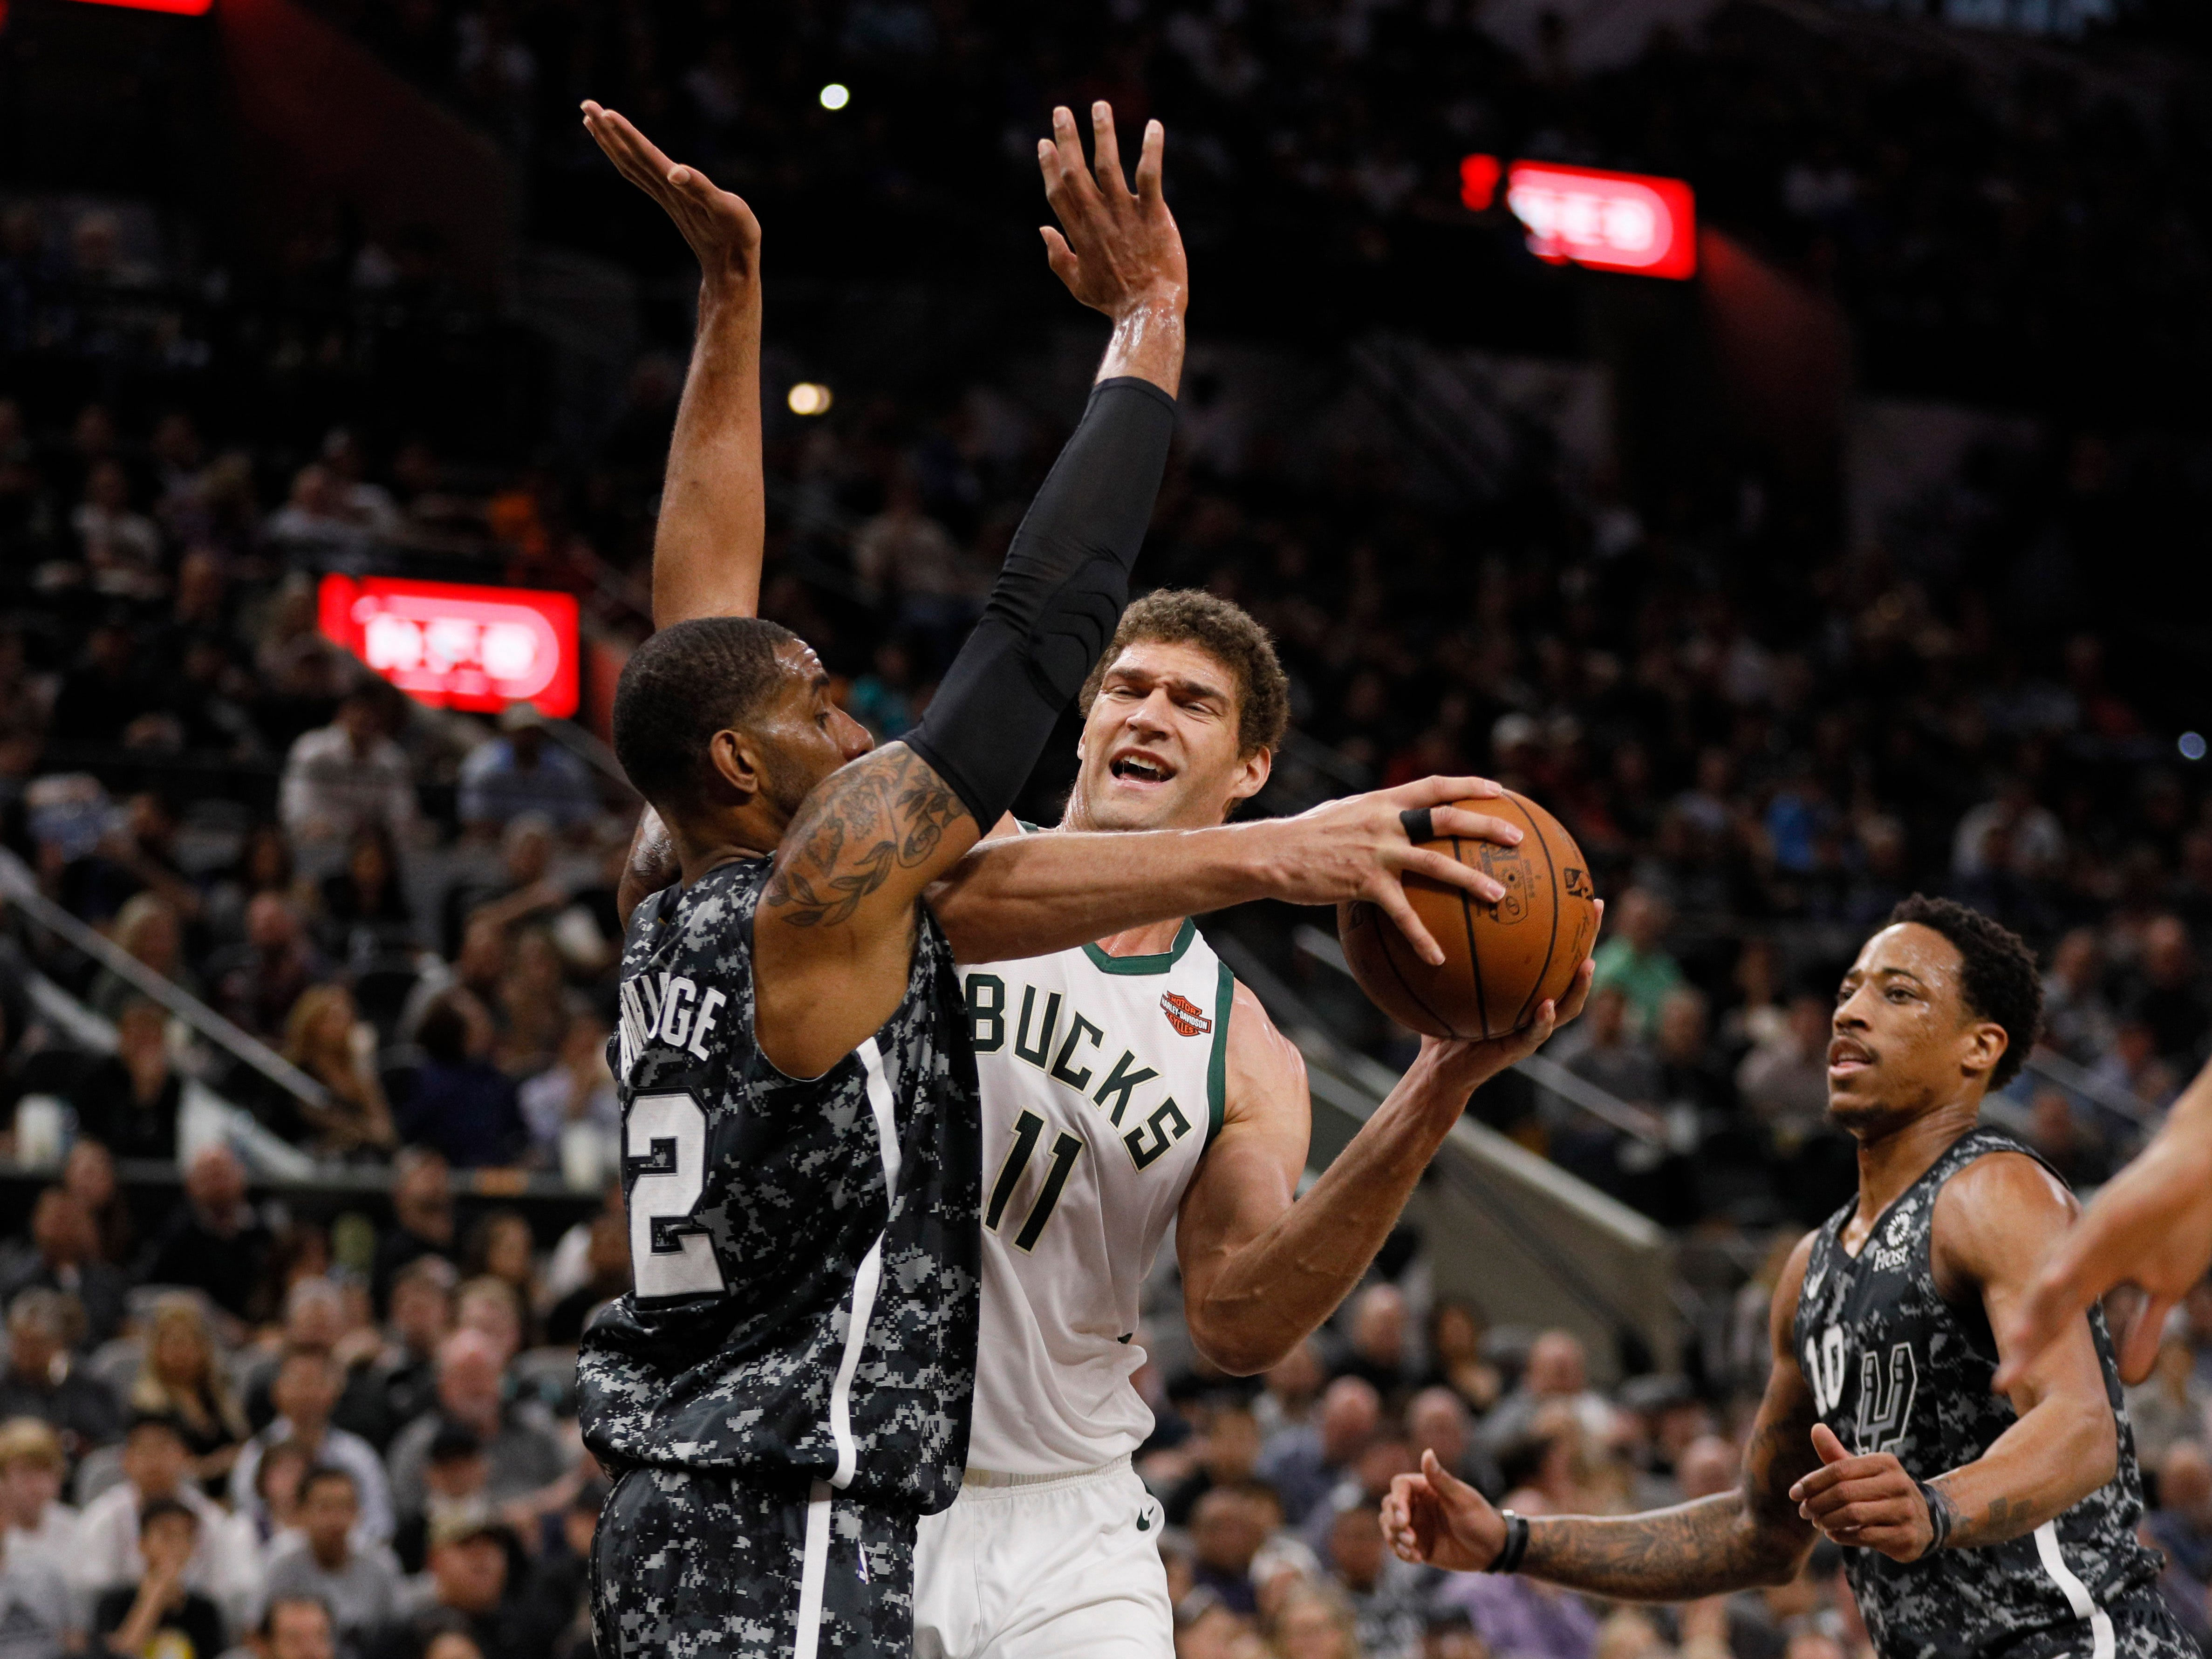 Bucks center Brook Lopez tries to power past Spurs forward LaMarcus Aldridge on his way to the basket Sunday.